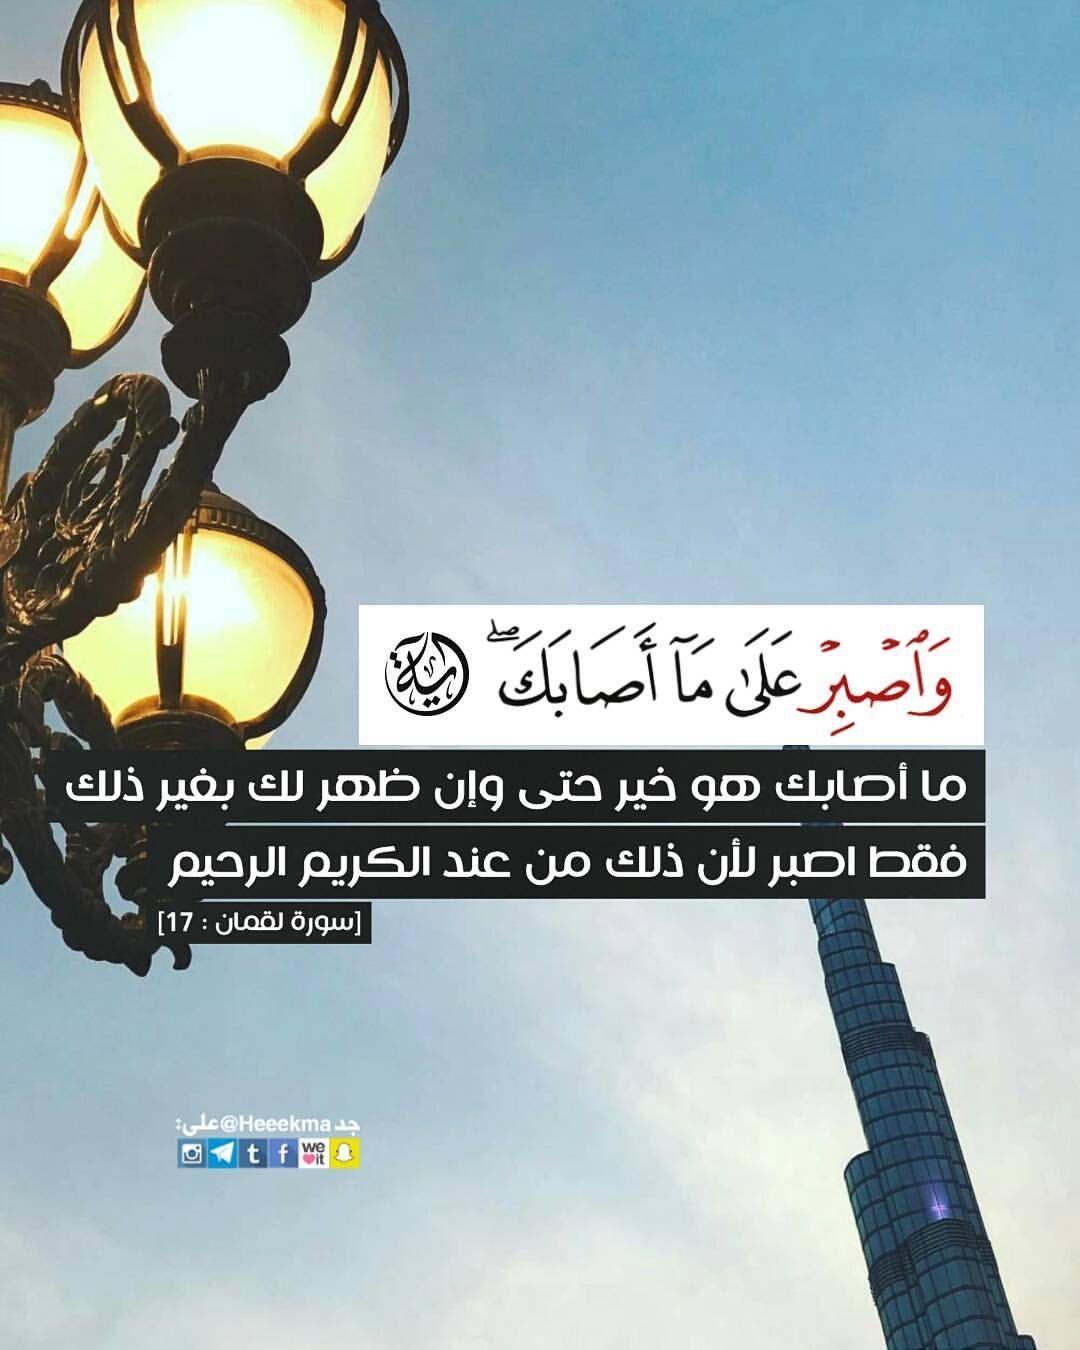 Pin By Raflam21 On آيات قرآنية Quran Quotes Inspirational Quran Tafseer Quran Verses